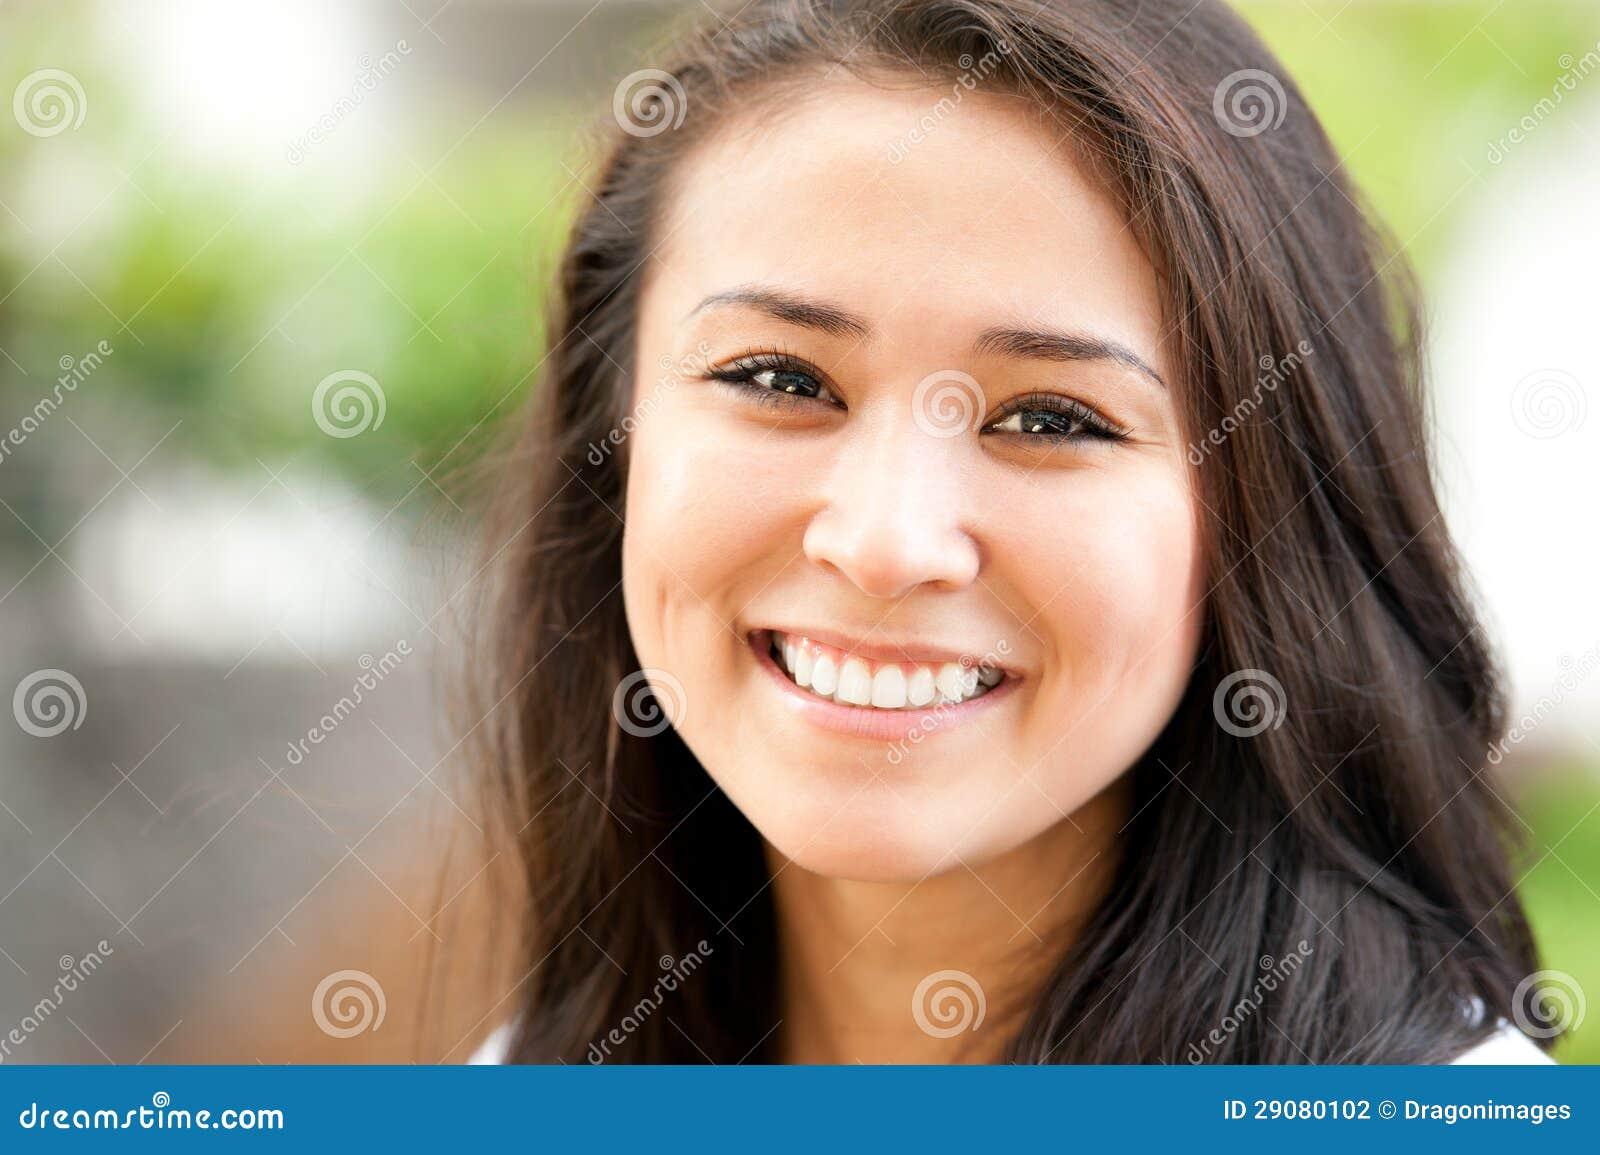 Charming young girl stock photography image 29080102 - Charming teenage girls image ...